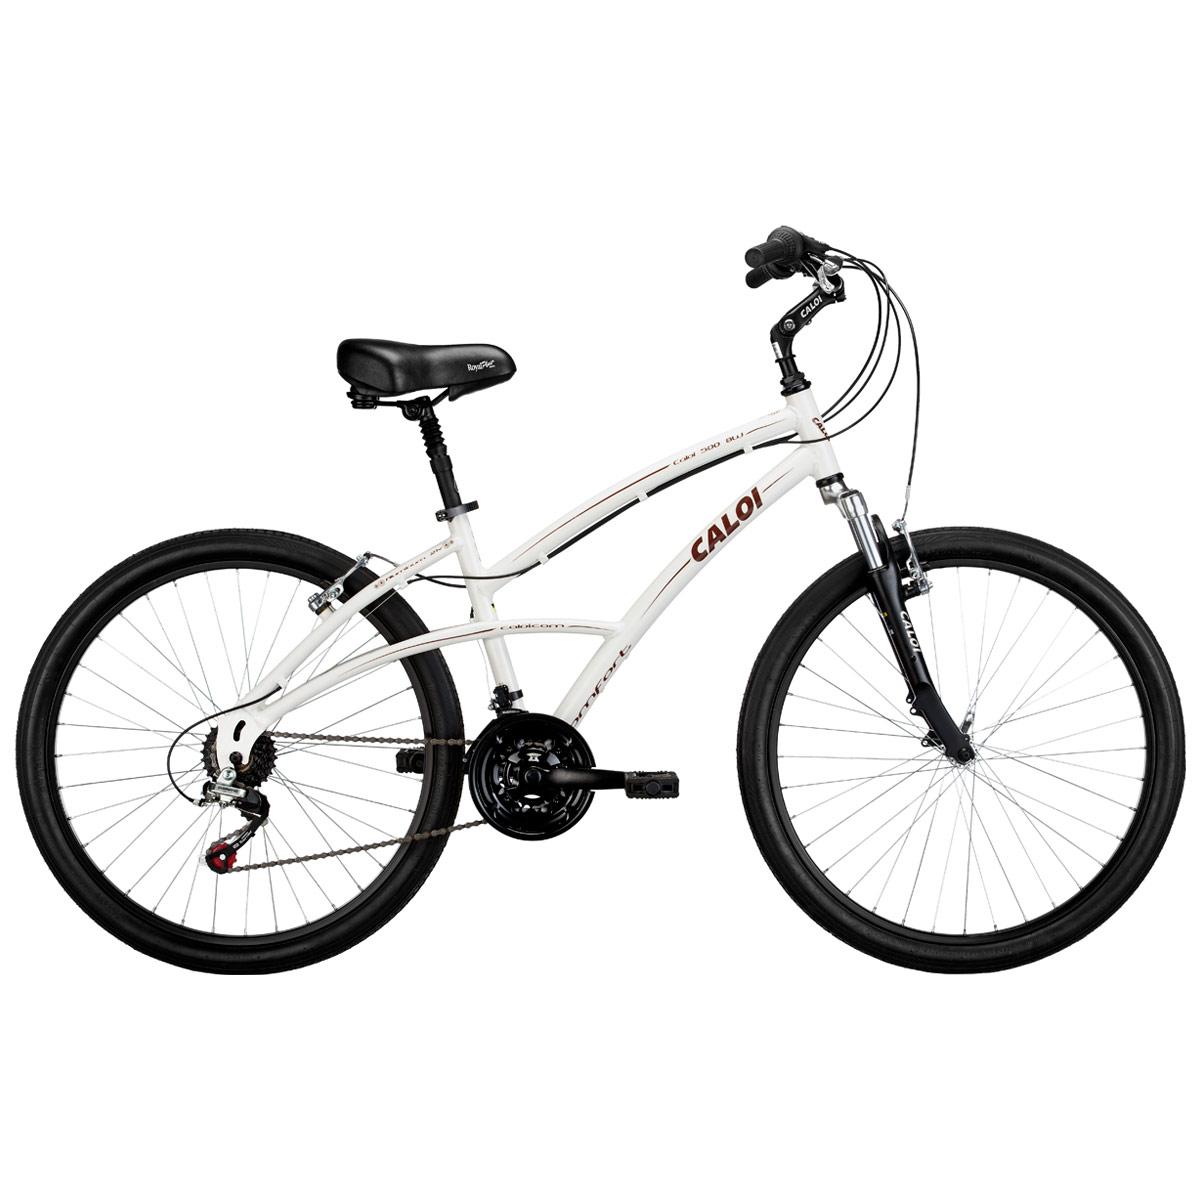 Bicicleta Caloi 500 Sport Aro 26 21 Marchas Aluminio